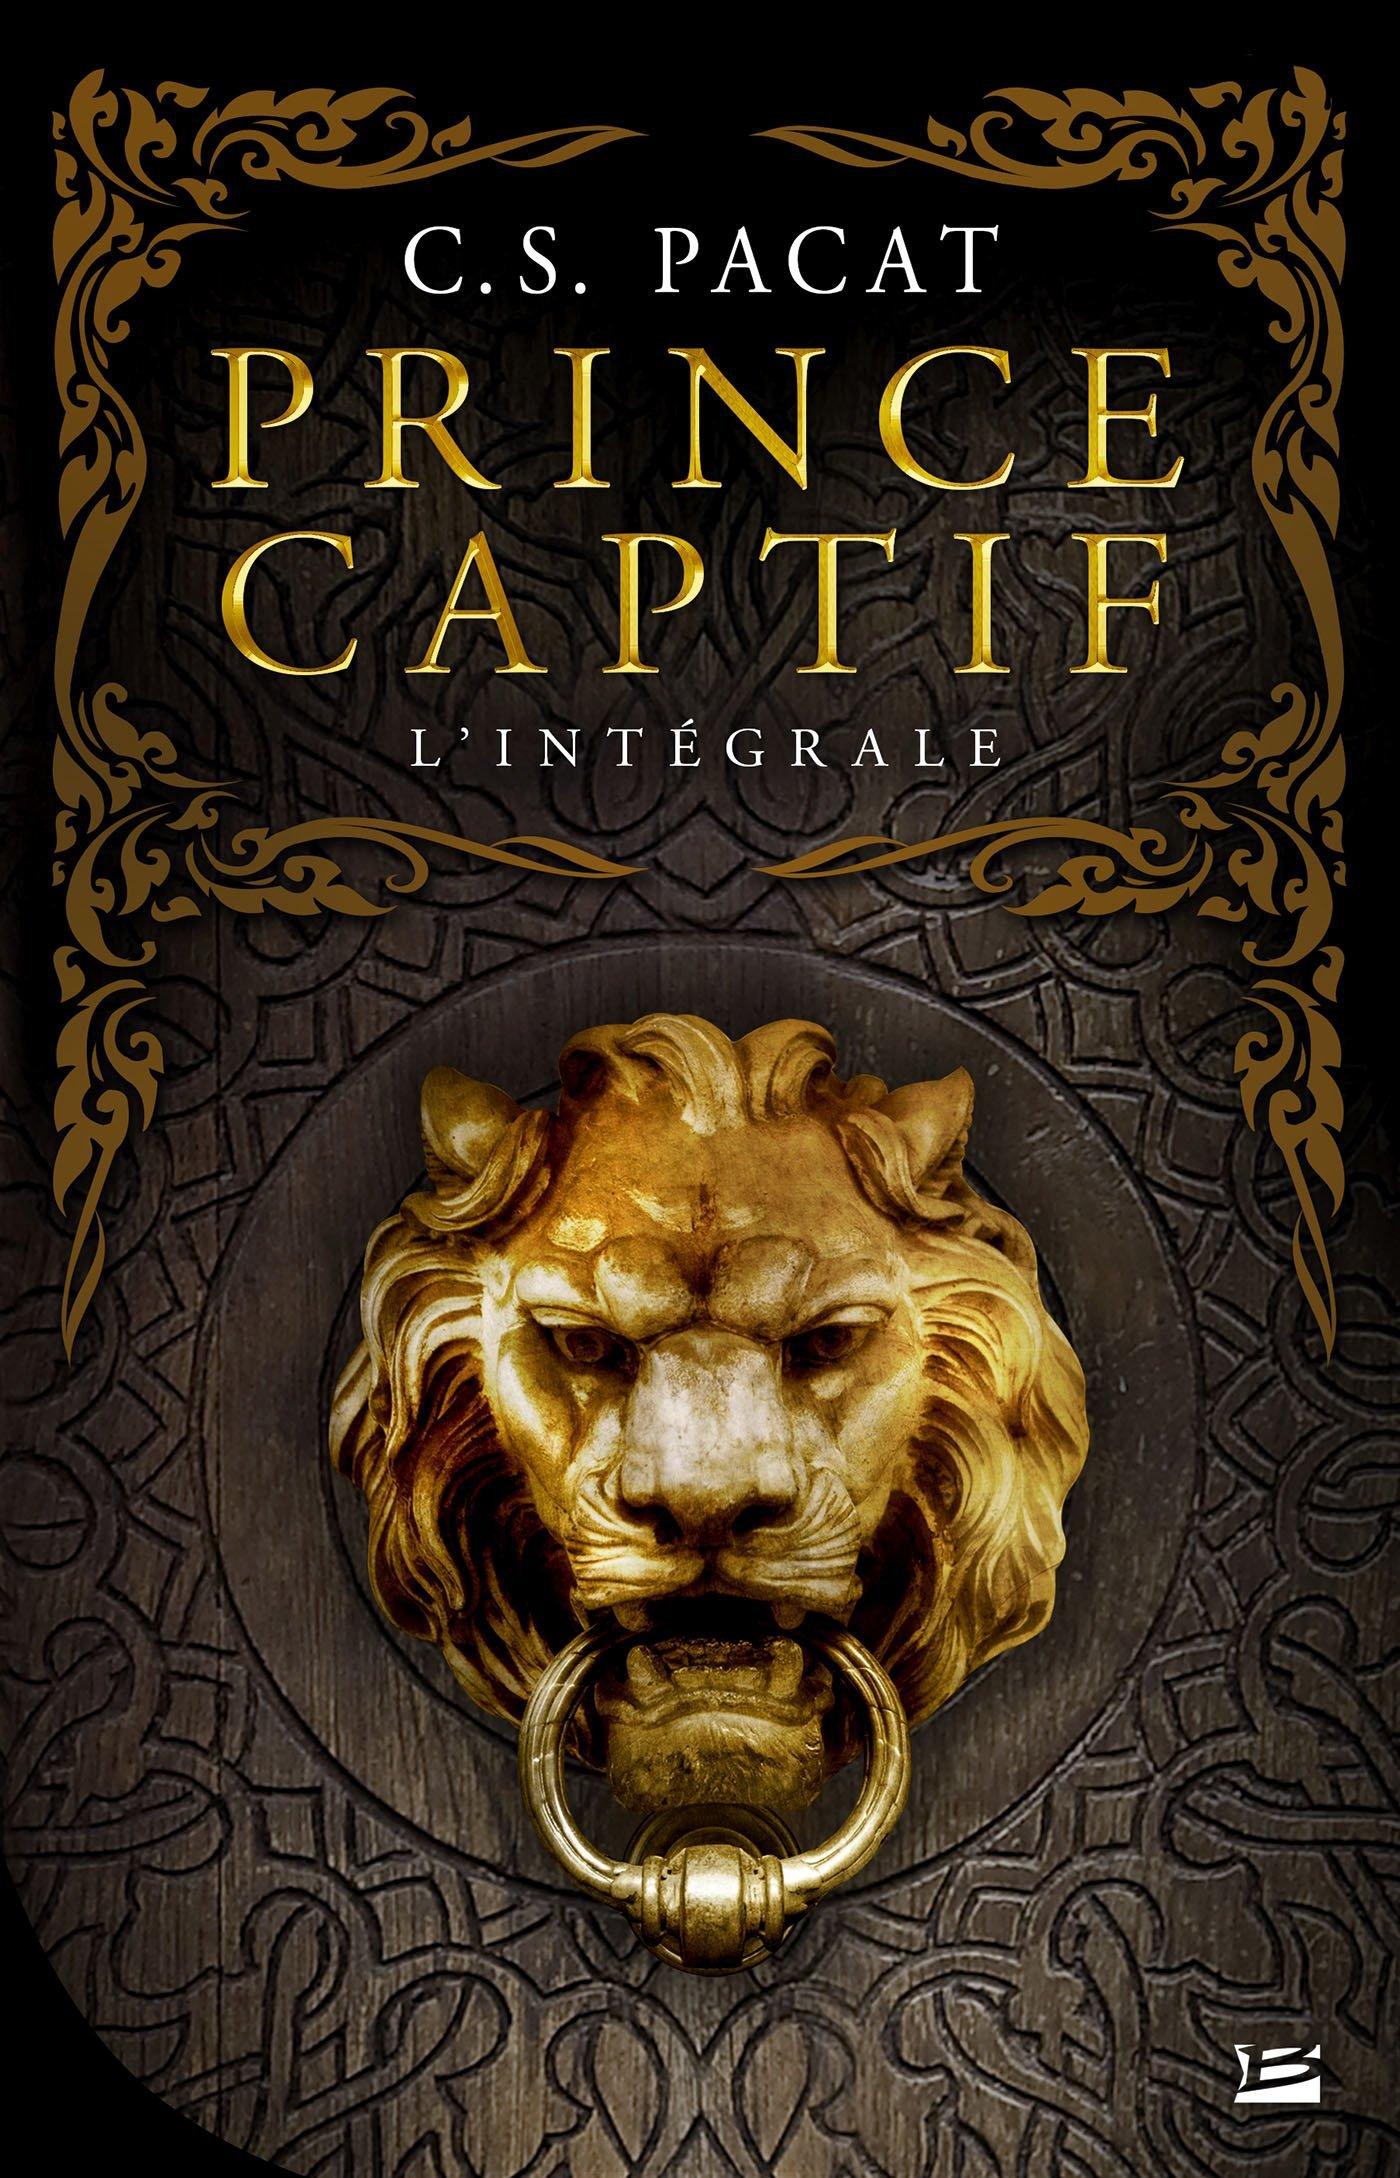 Prince Captif de C.S. Pacat